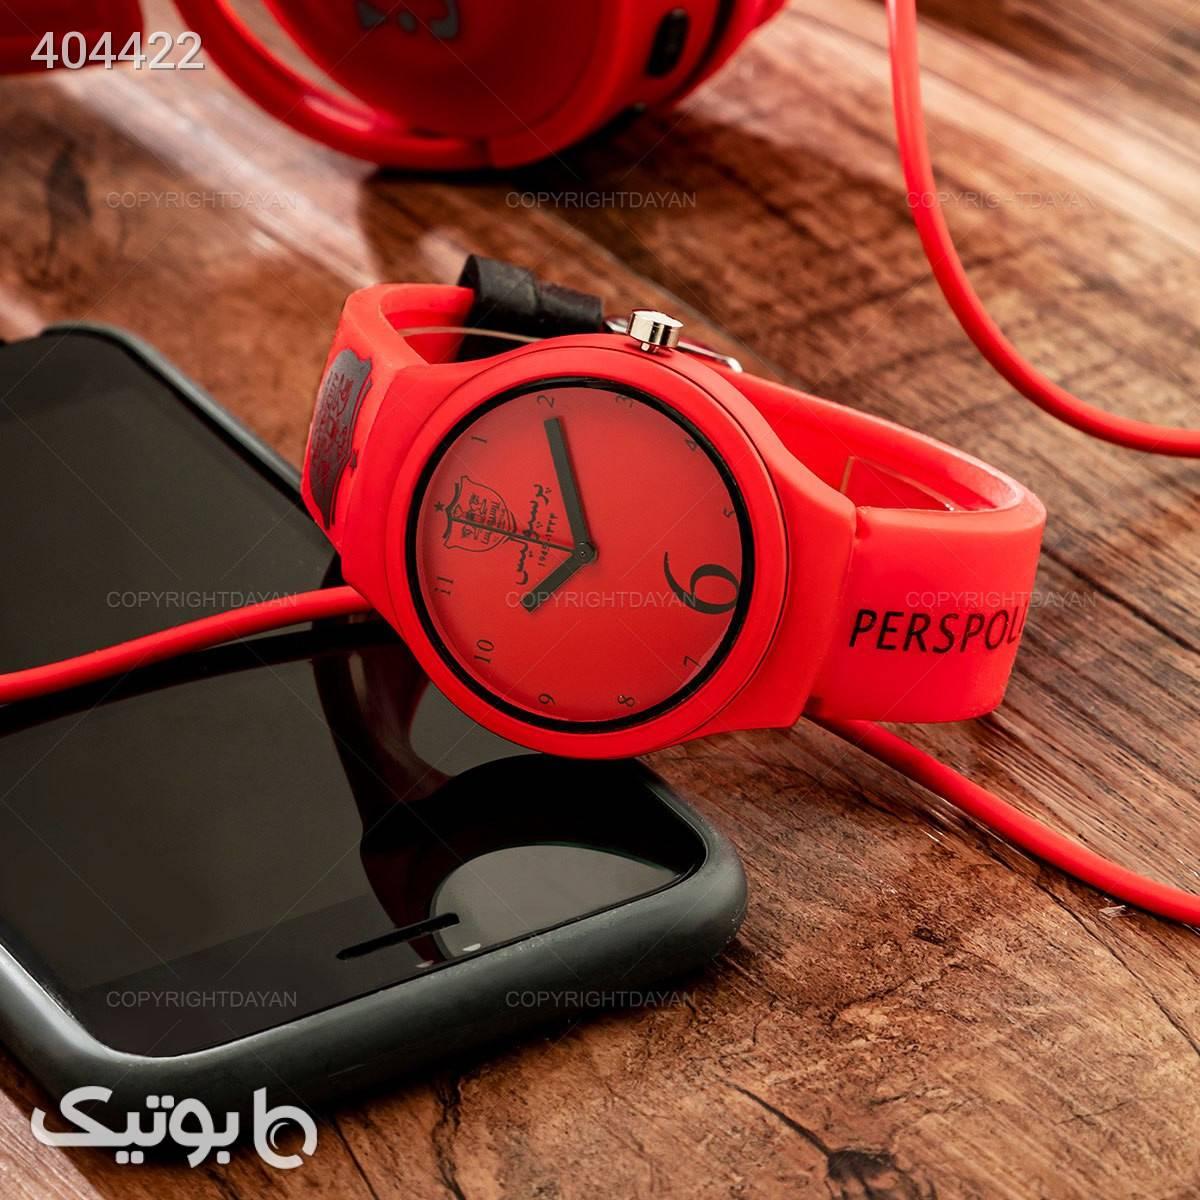 ساعت مچی  Perspolis مدل 12601 قرمز ساعت